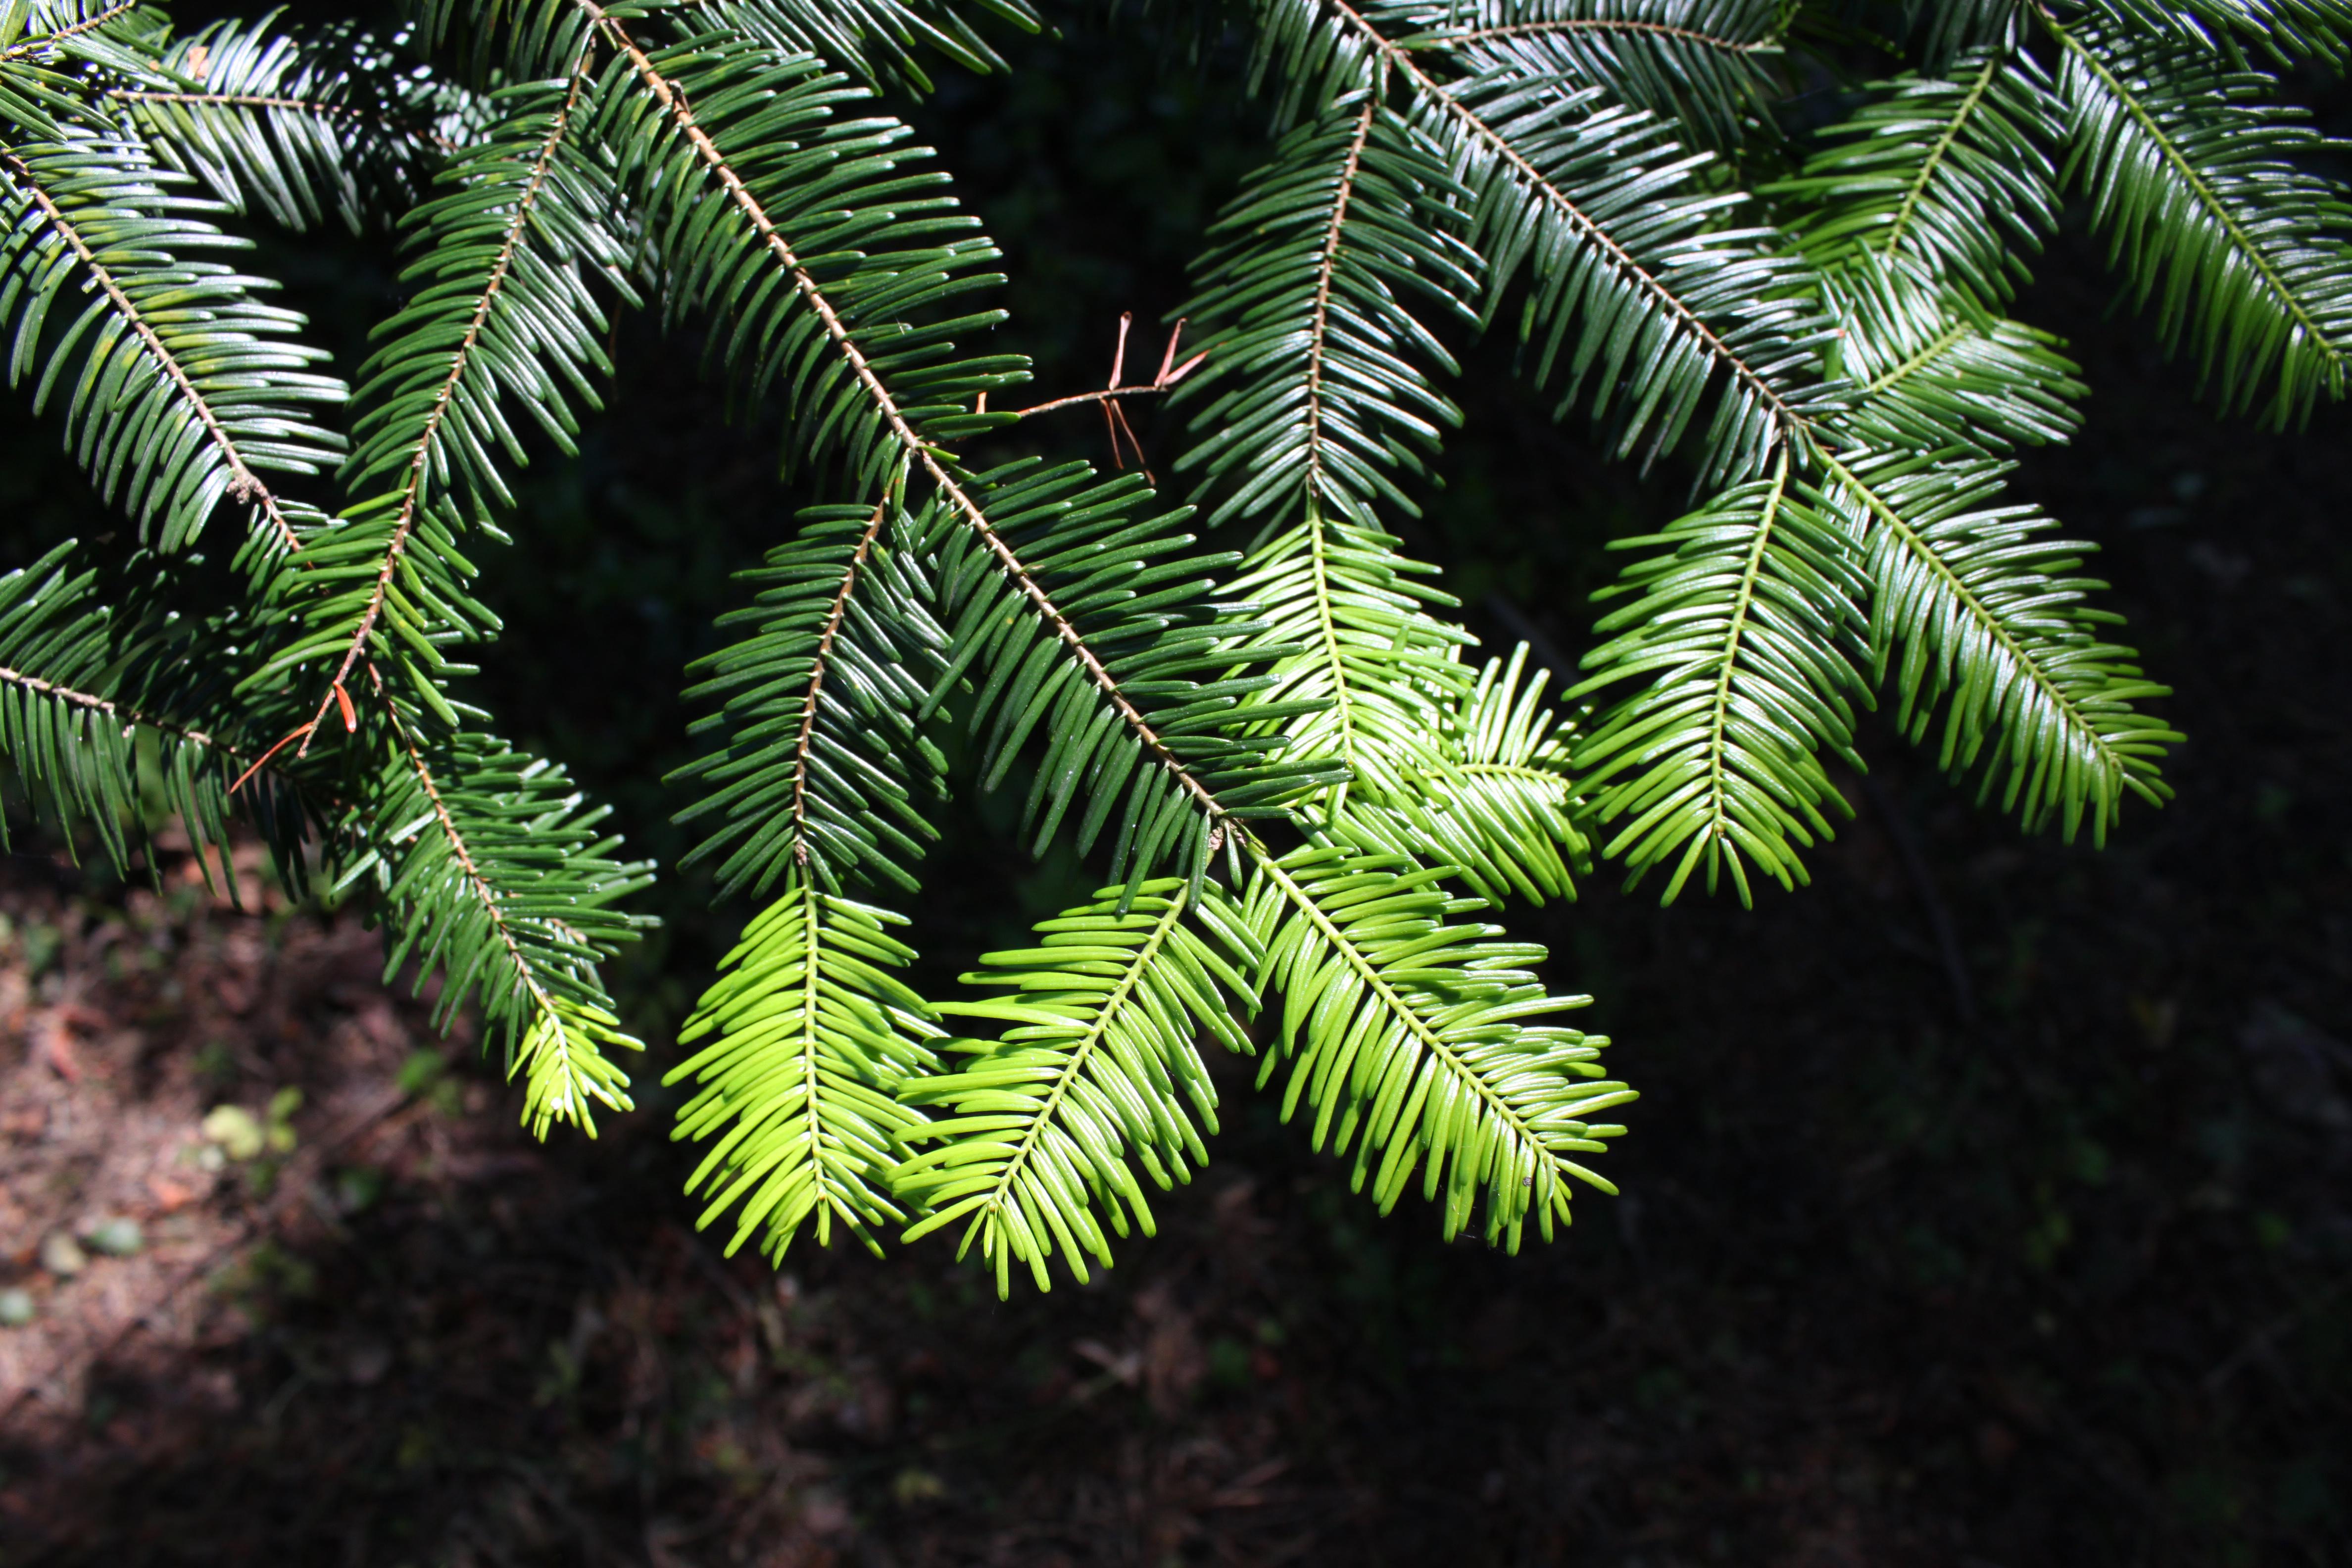 Fileabies Grandis Foliagejpg Wikimedia Commons